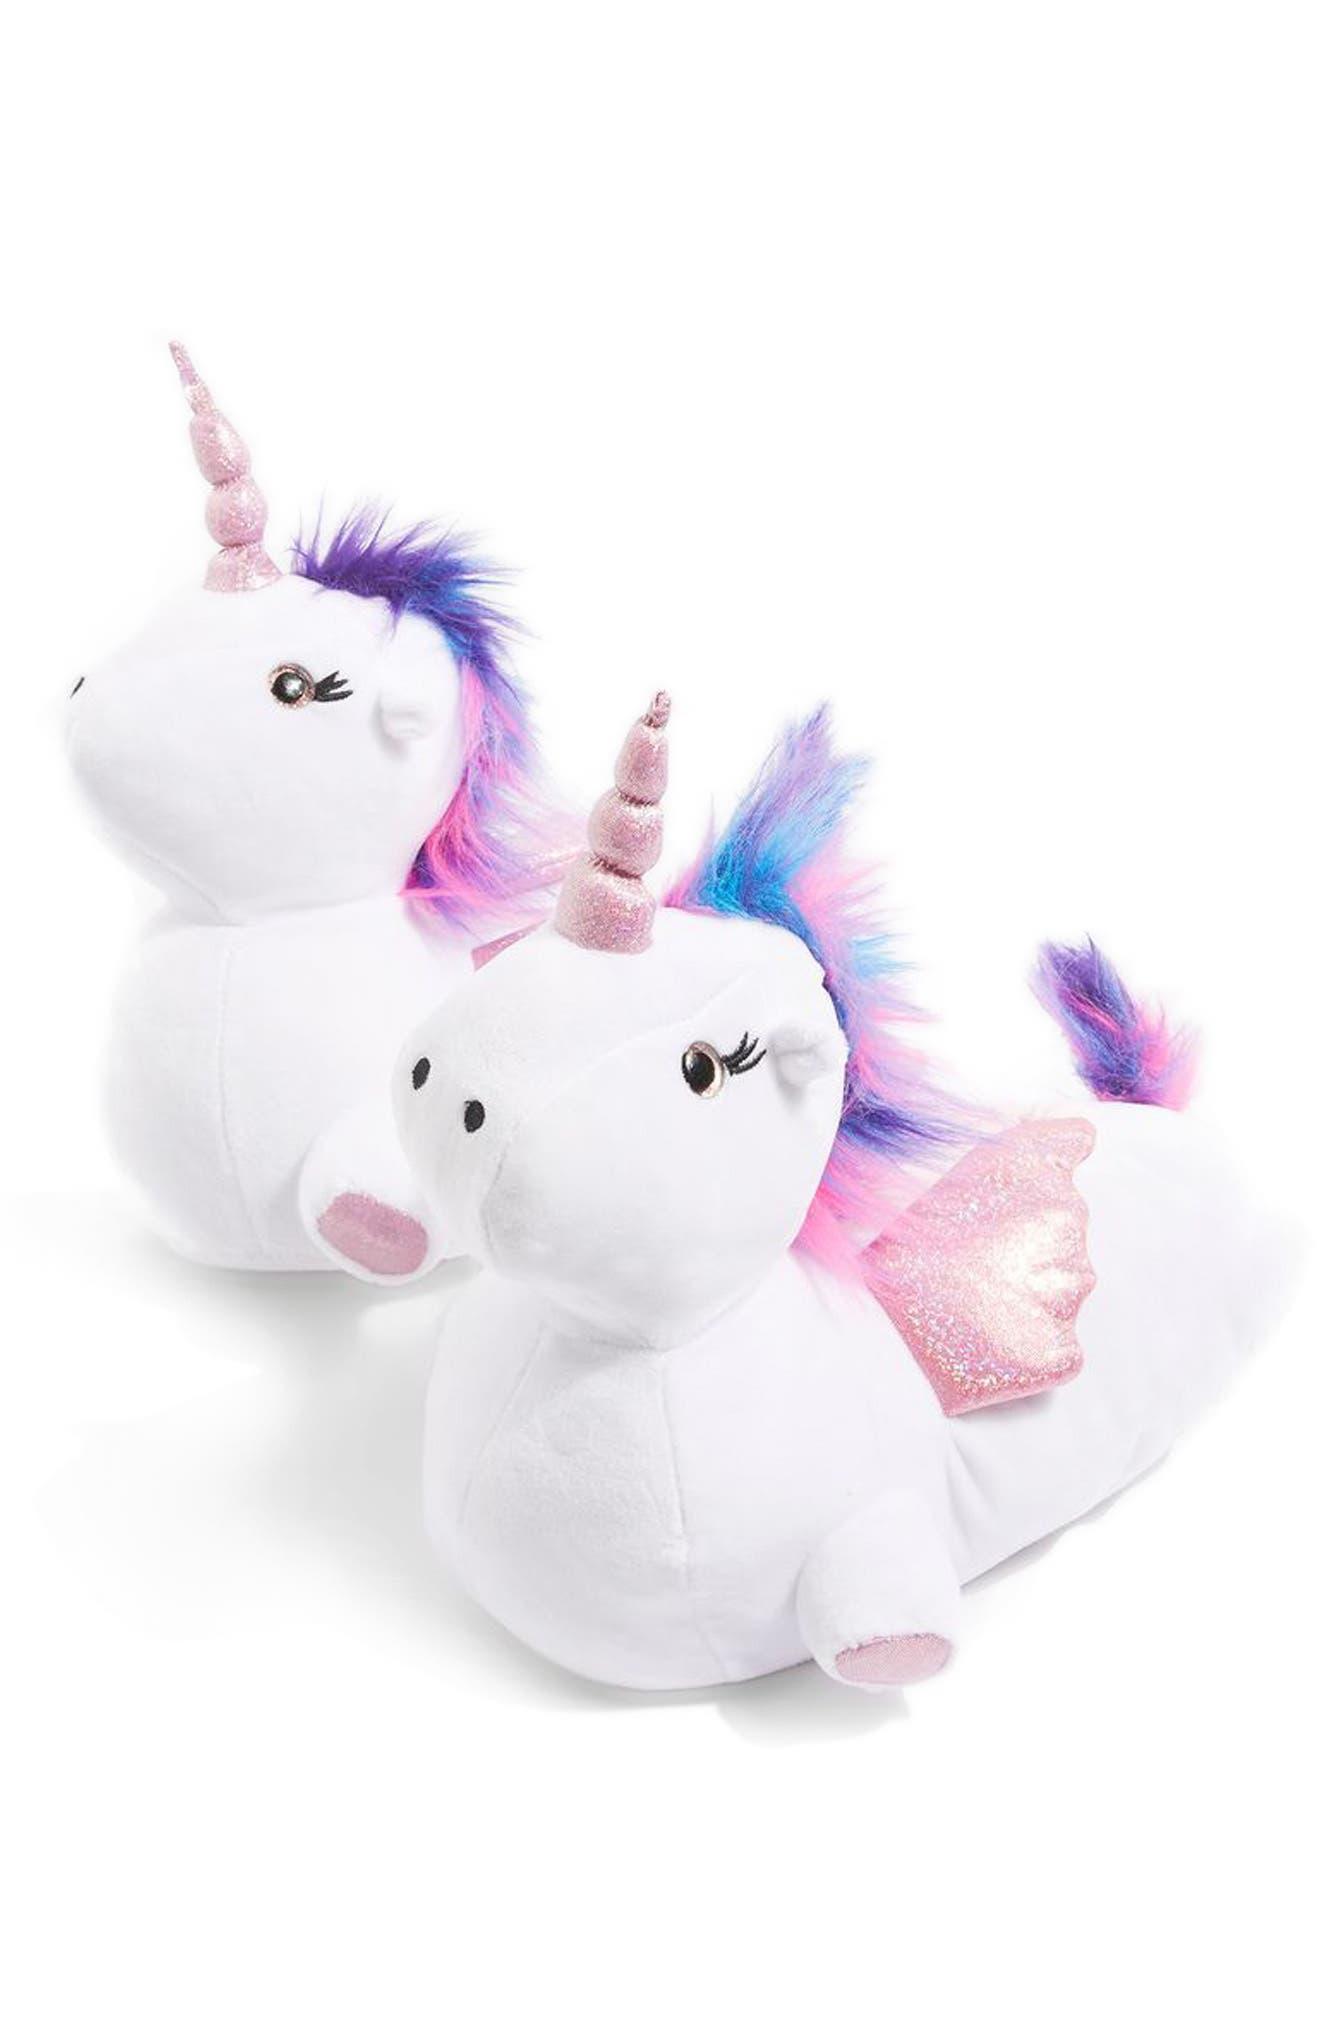 Topshop Luna Unicorn Slippers